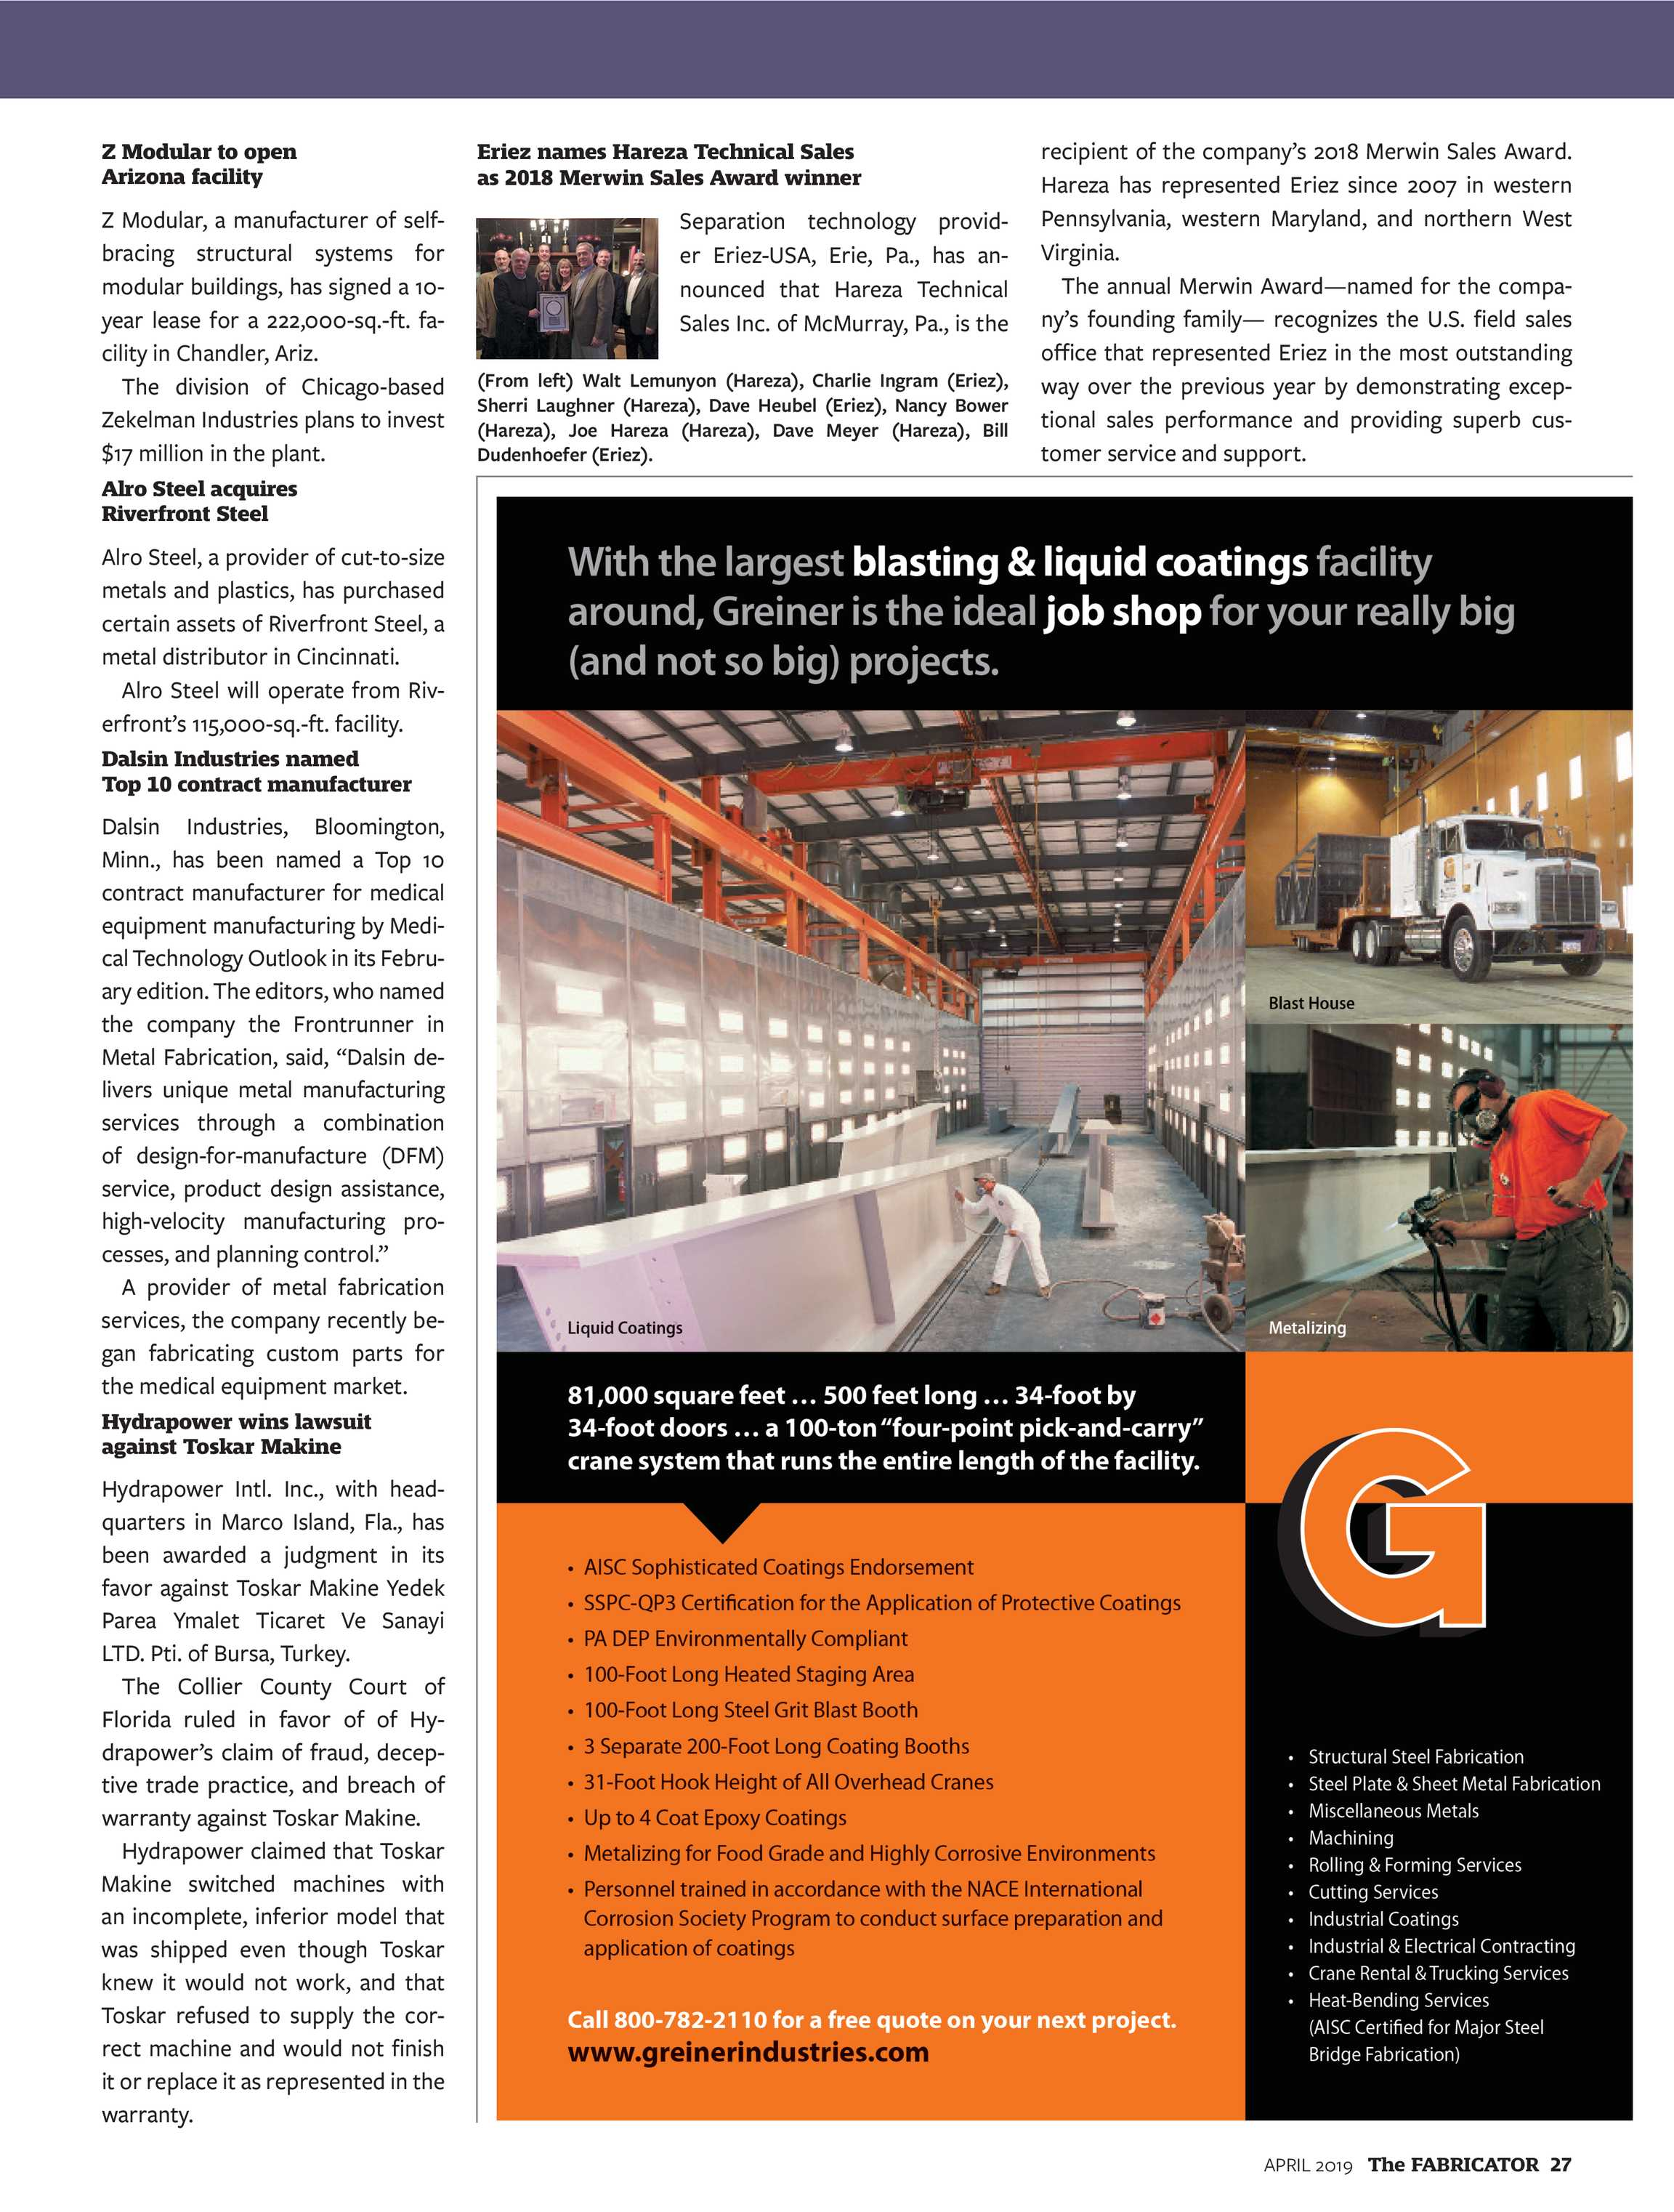 The Fabricator - April 2019 - page 27